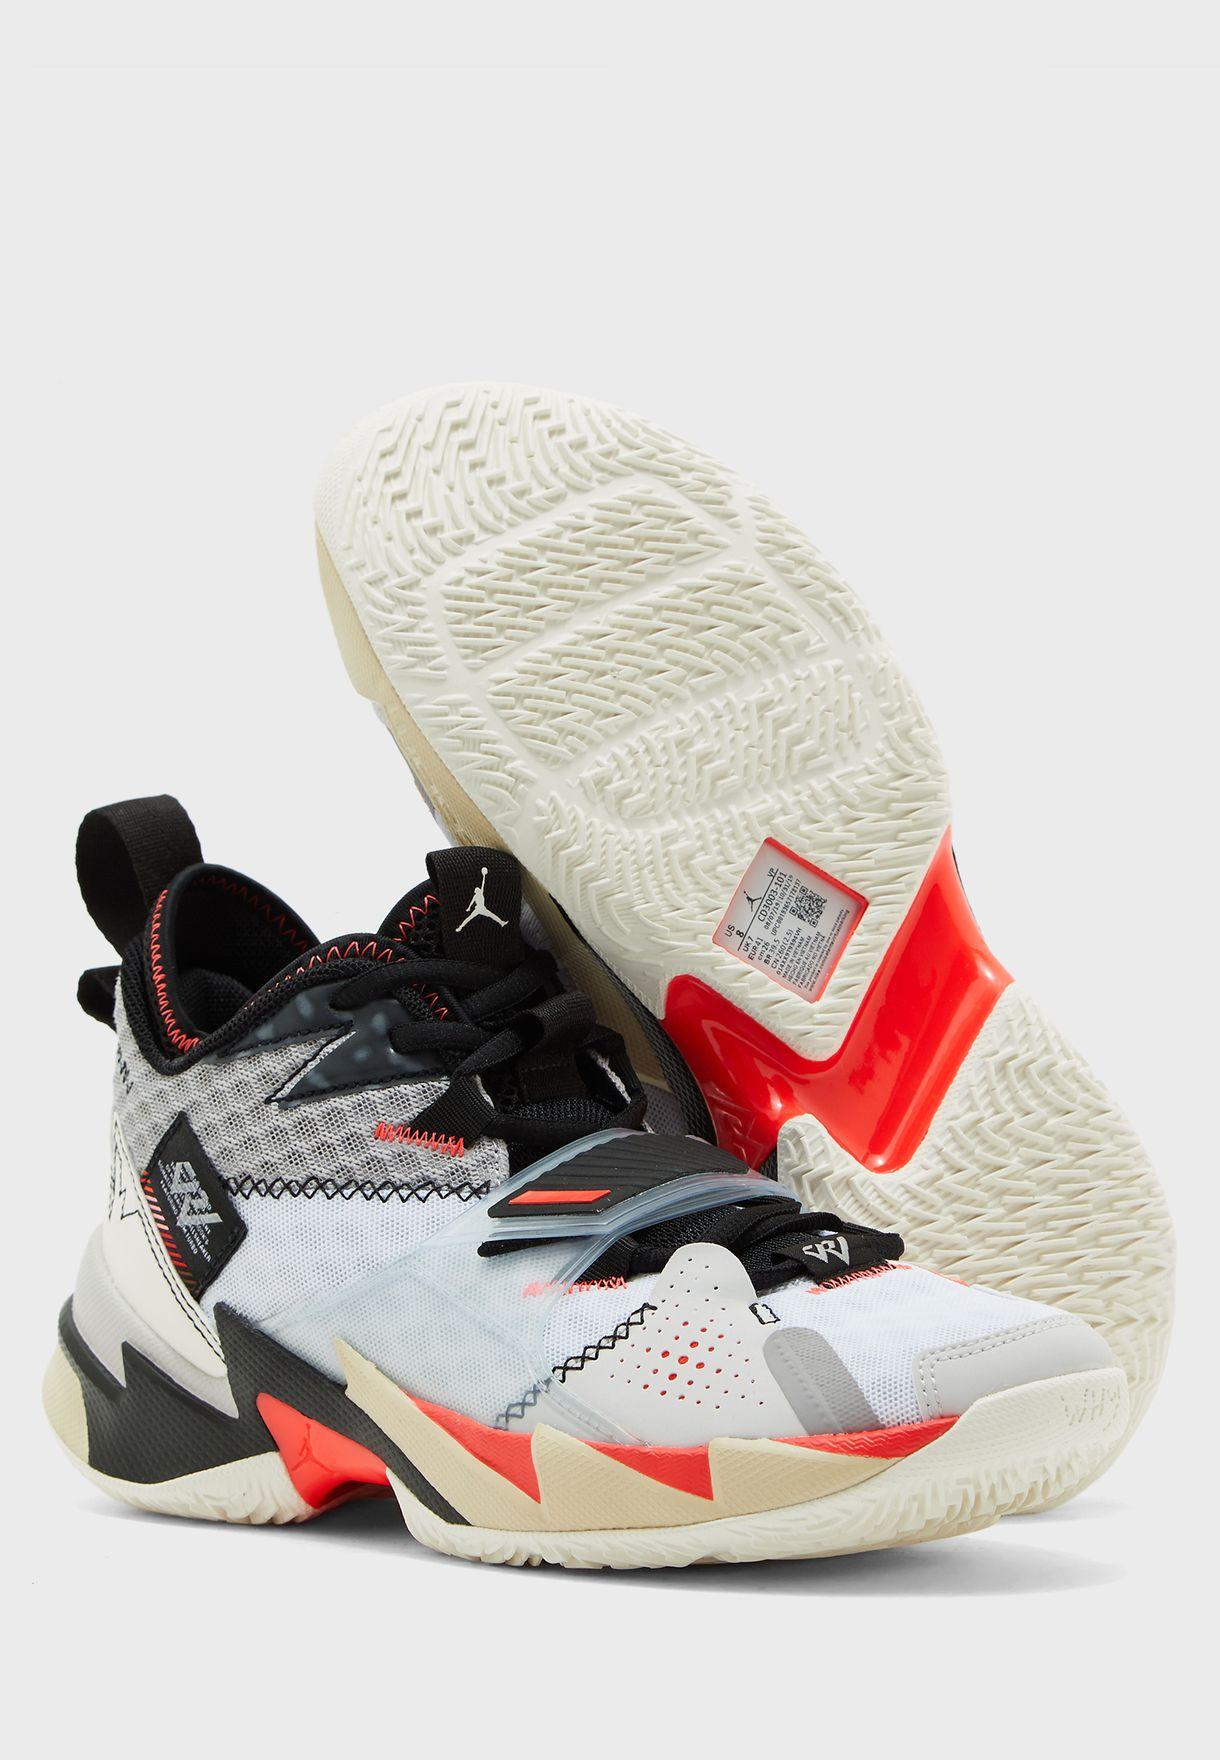 Jordan Why Not Zero.3